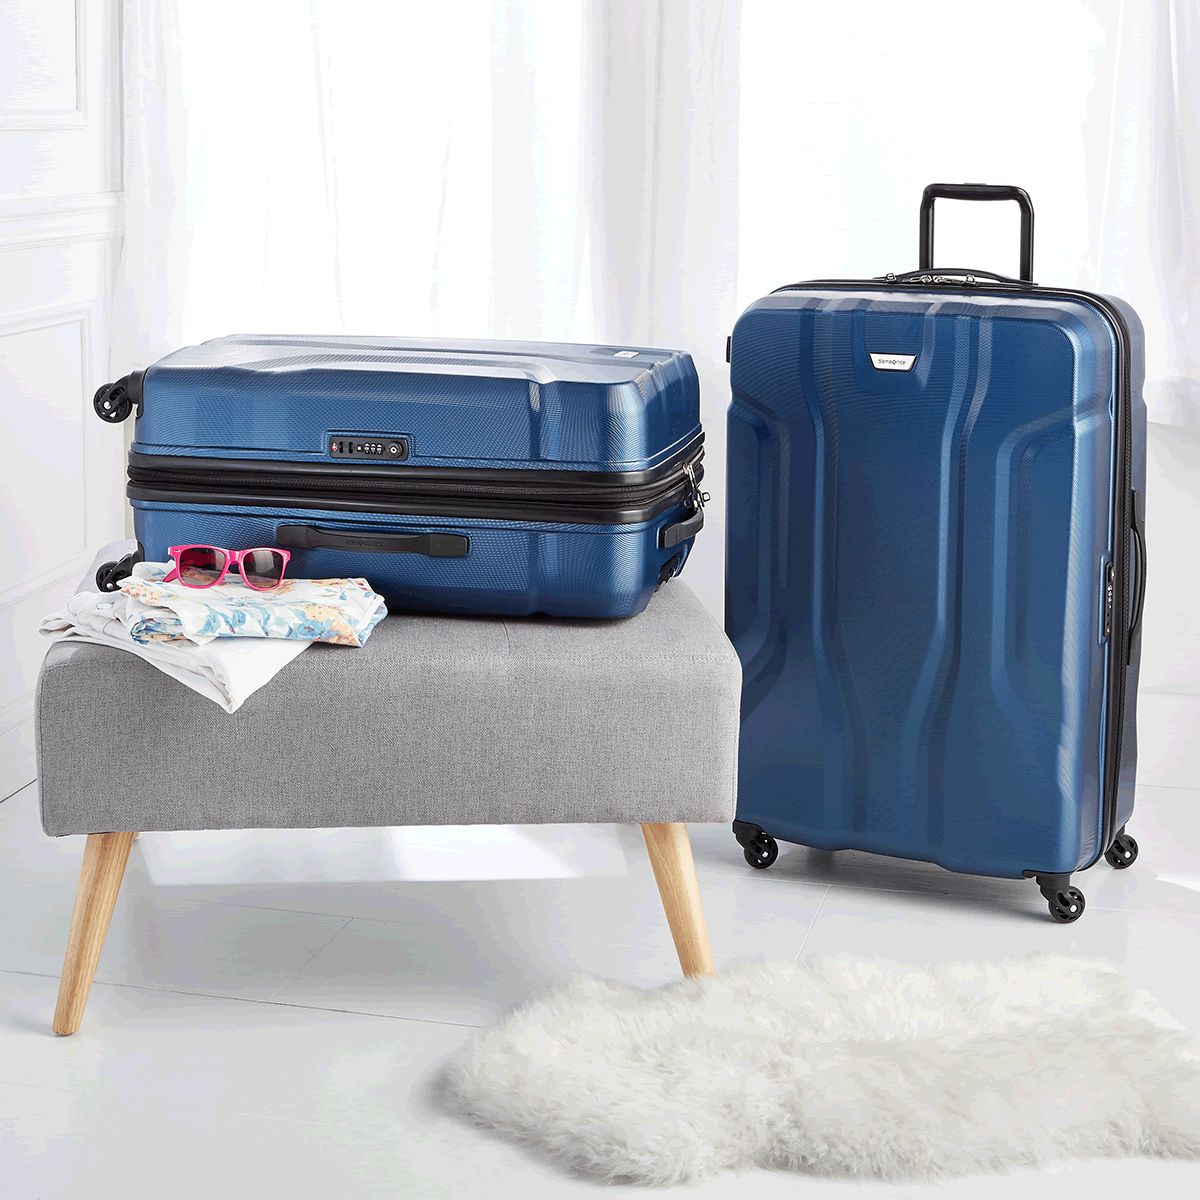 077206e6e Checked Luggage - Baggage & Luggage - Macy's